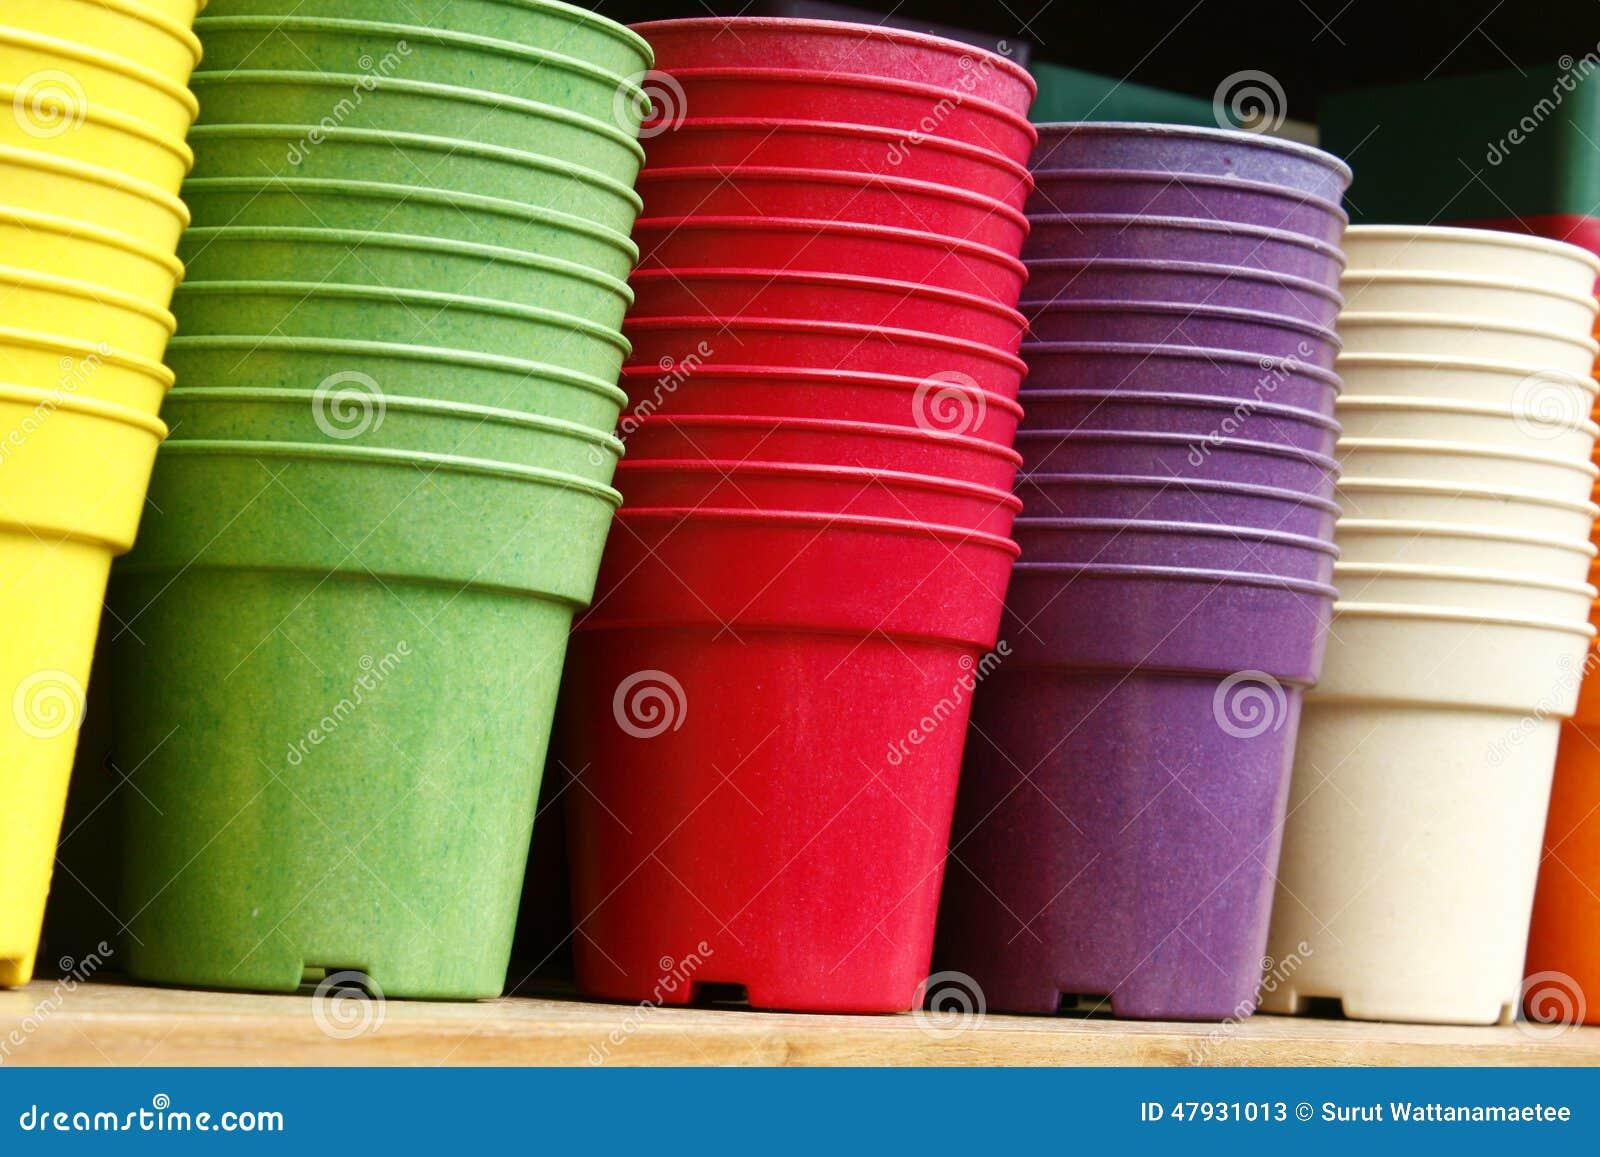 flowerpots - plastic flower pots stock image - image of closeup